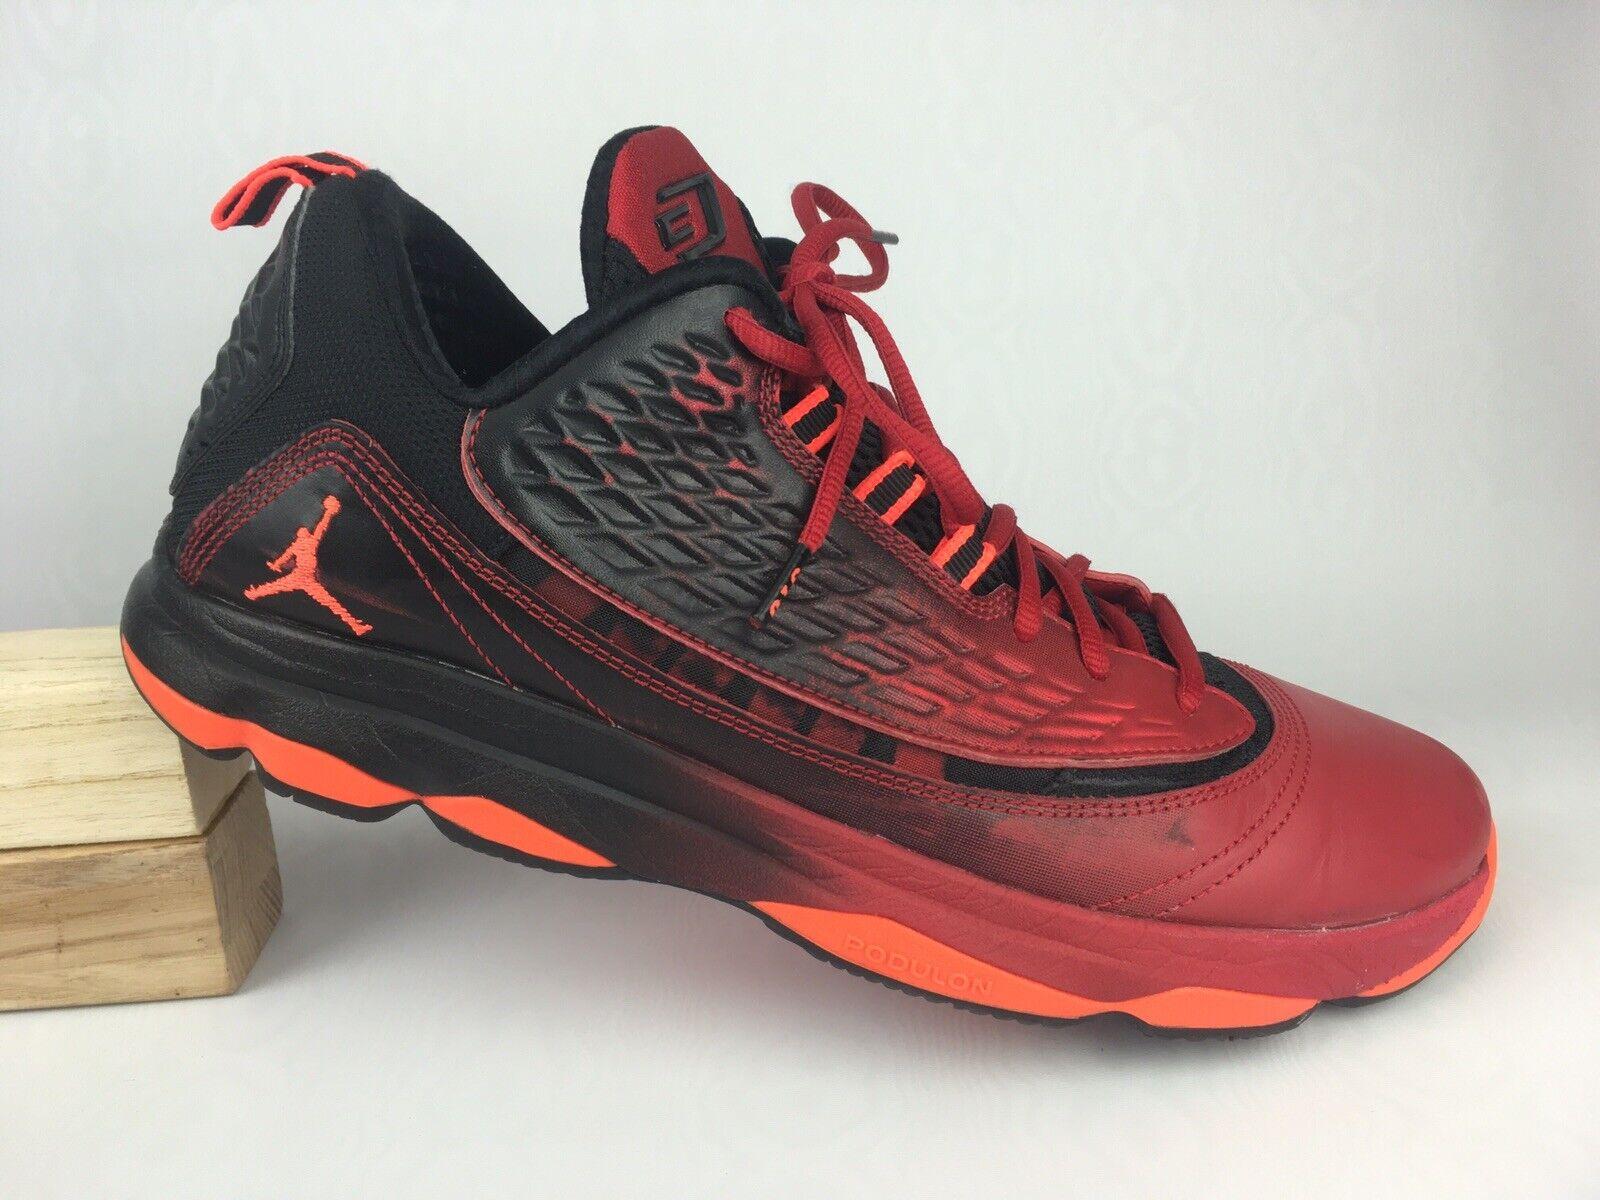 959aadf9a1fd Nike Jordan Cp3 VI AE 580580-608 Red crimson black Size 11.5 ...